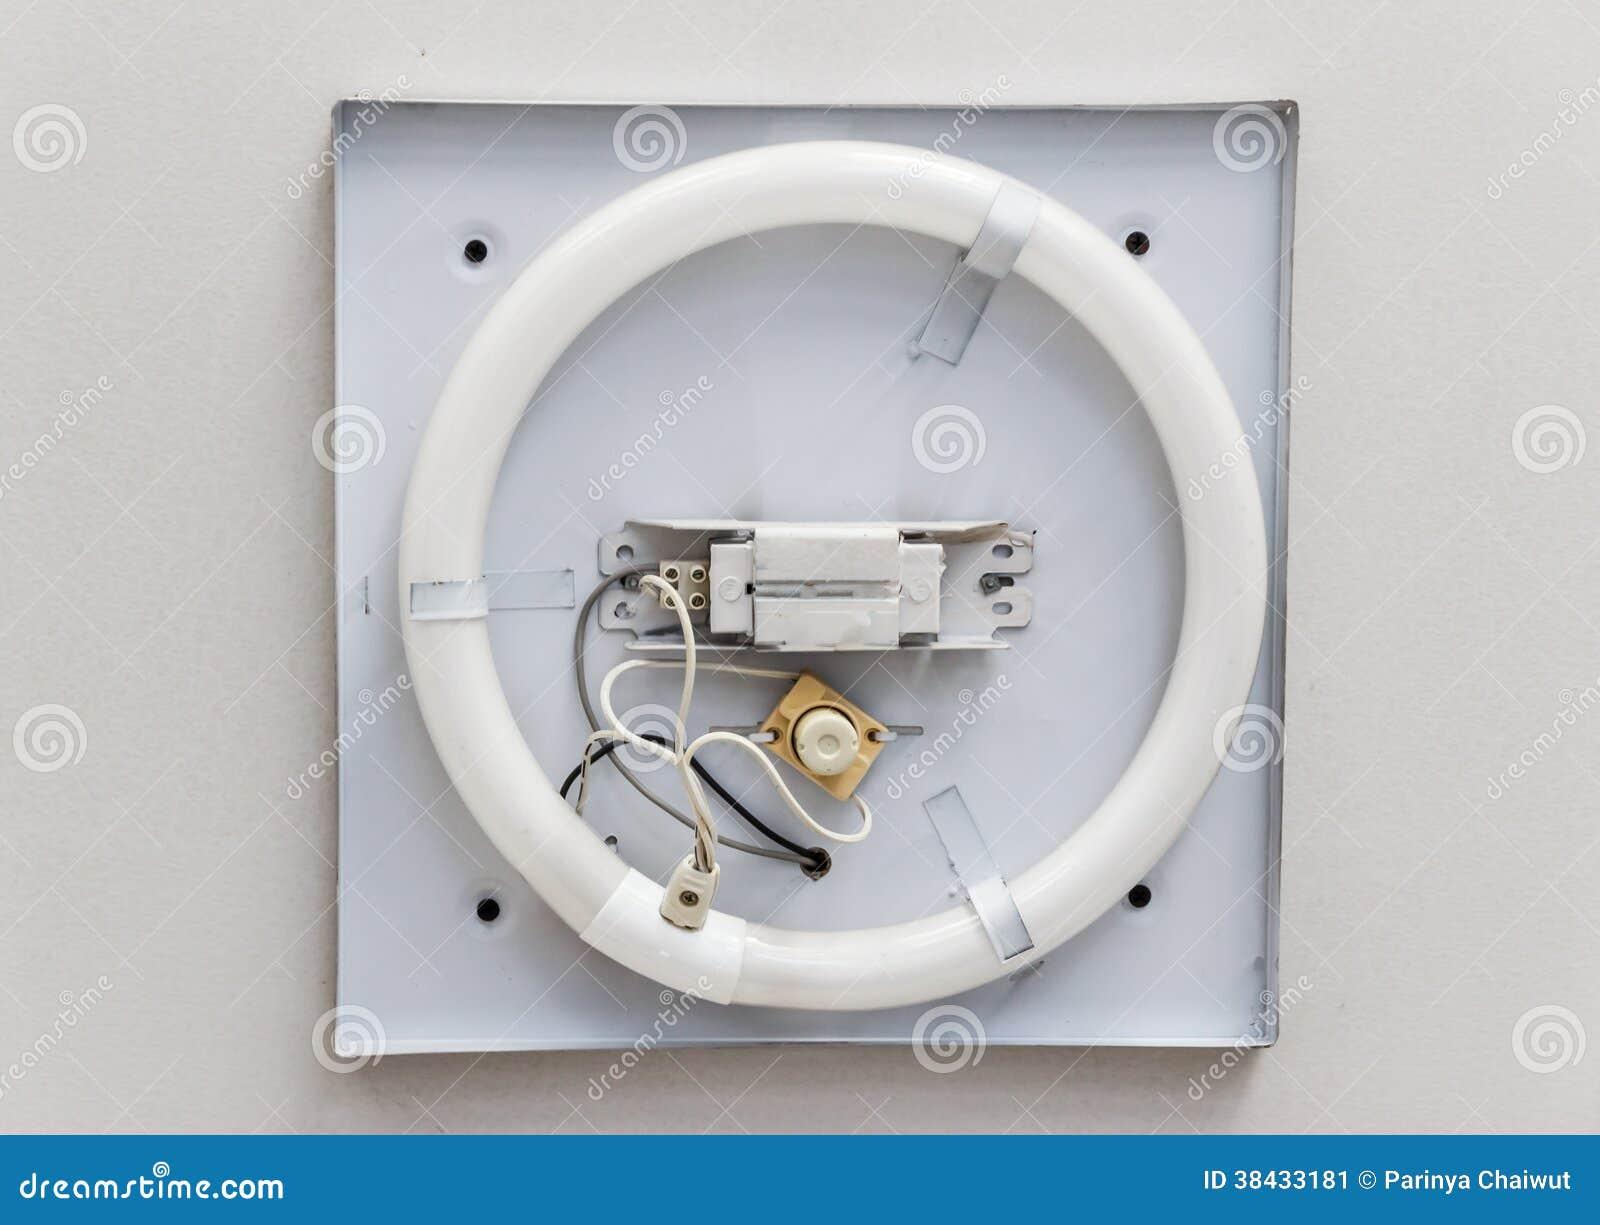 Circline Fluorescent Lamp Stock Image